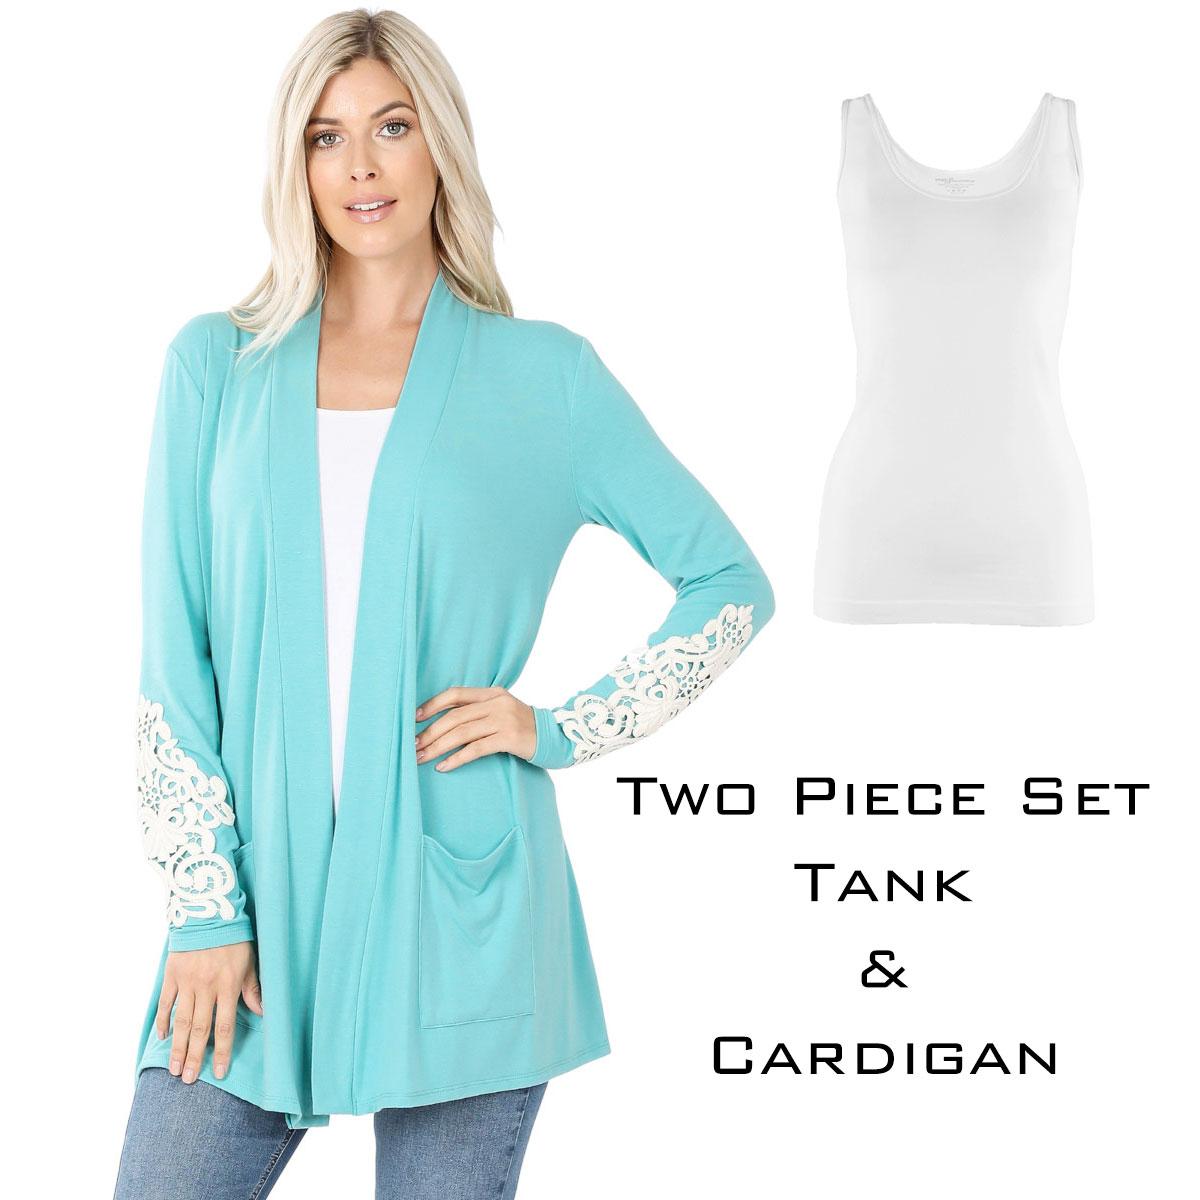 Cardigan Set - Lace Patch Slouchy Pocket 1446 - ASH MINT Cardigan Set - Lace Patch Slouchy Pocket 1446